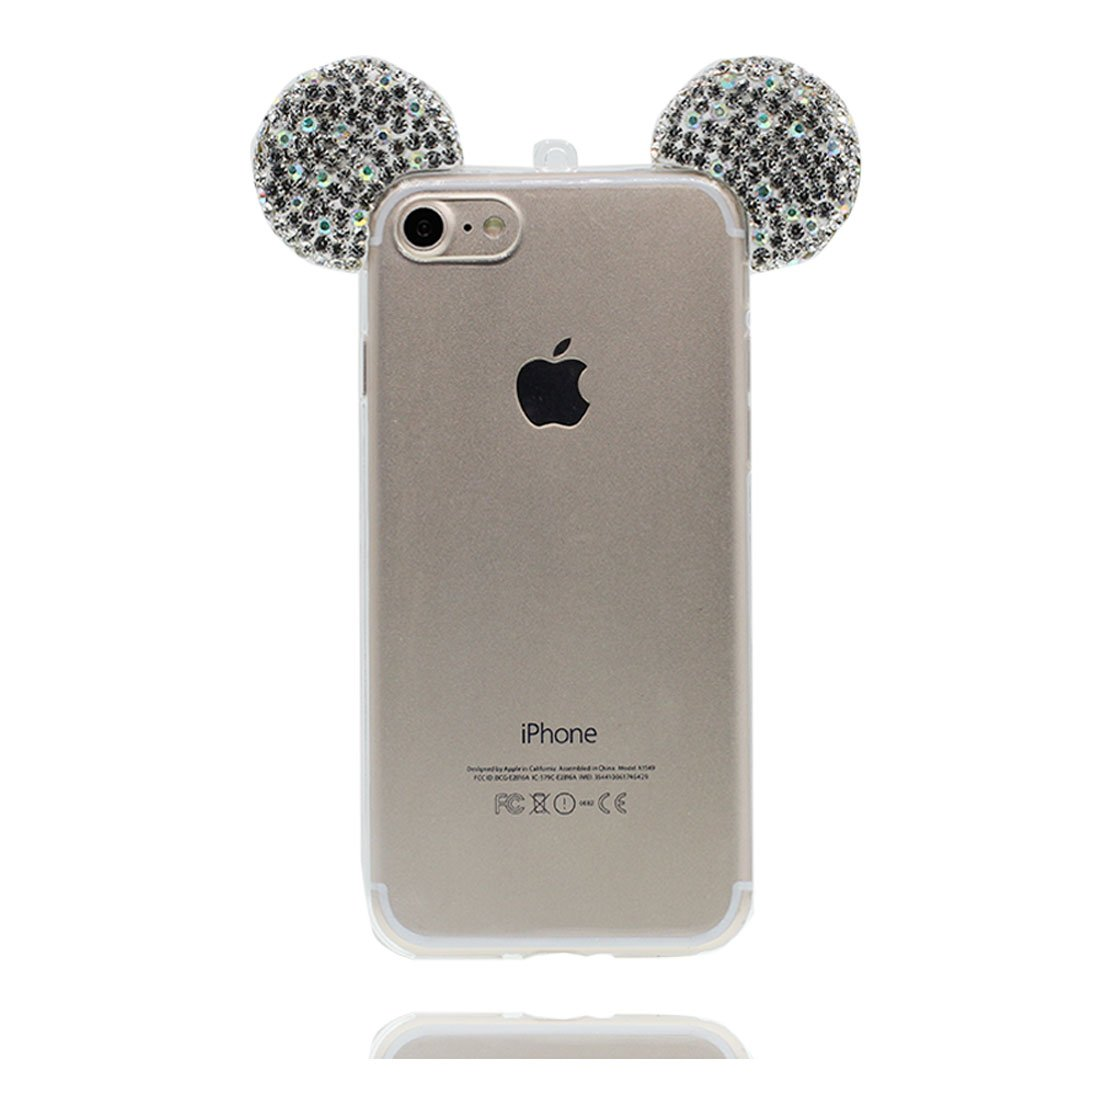 f77a9eb4bc9 YuanYuZhongPhoneSky iPhone 6 Carcasa, iPhone 6s Funda Premium TPU  Transparente de Silicona en iPhone 6S Case [Ajustado] [Shock Absorption]:  Amazon.es: ...